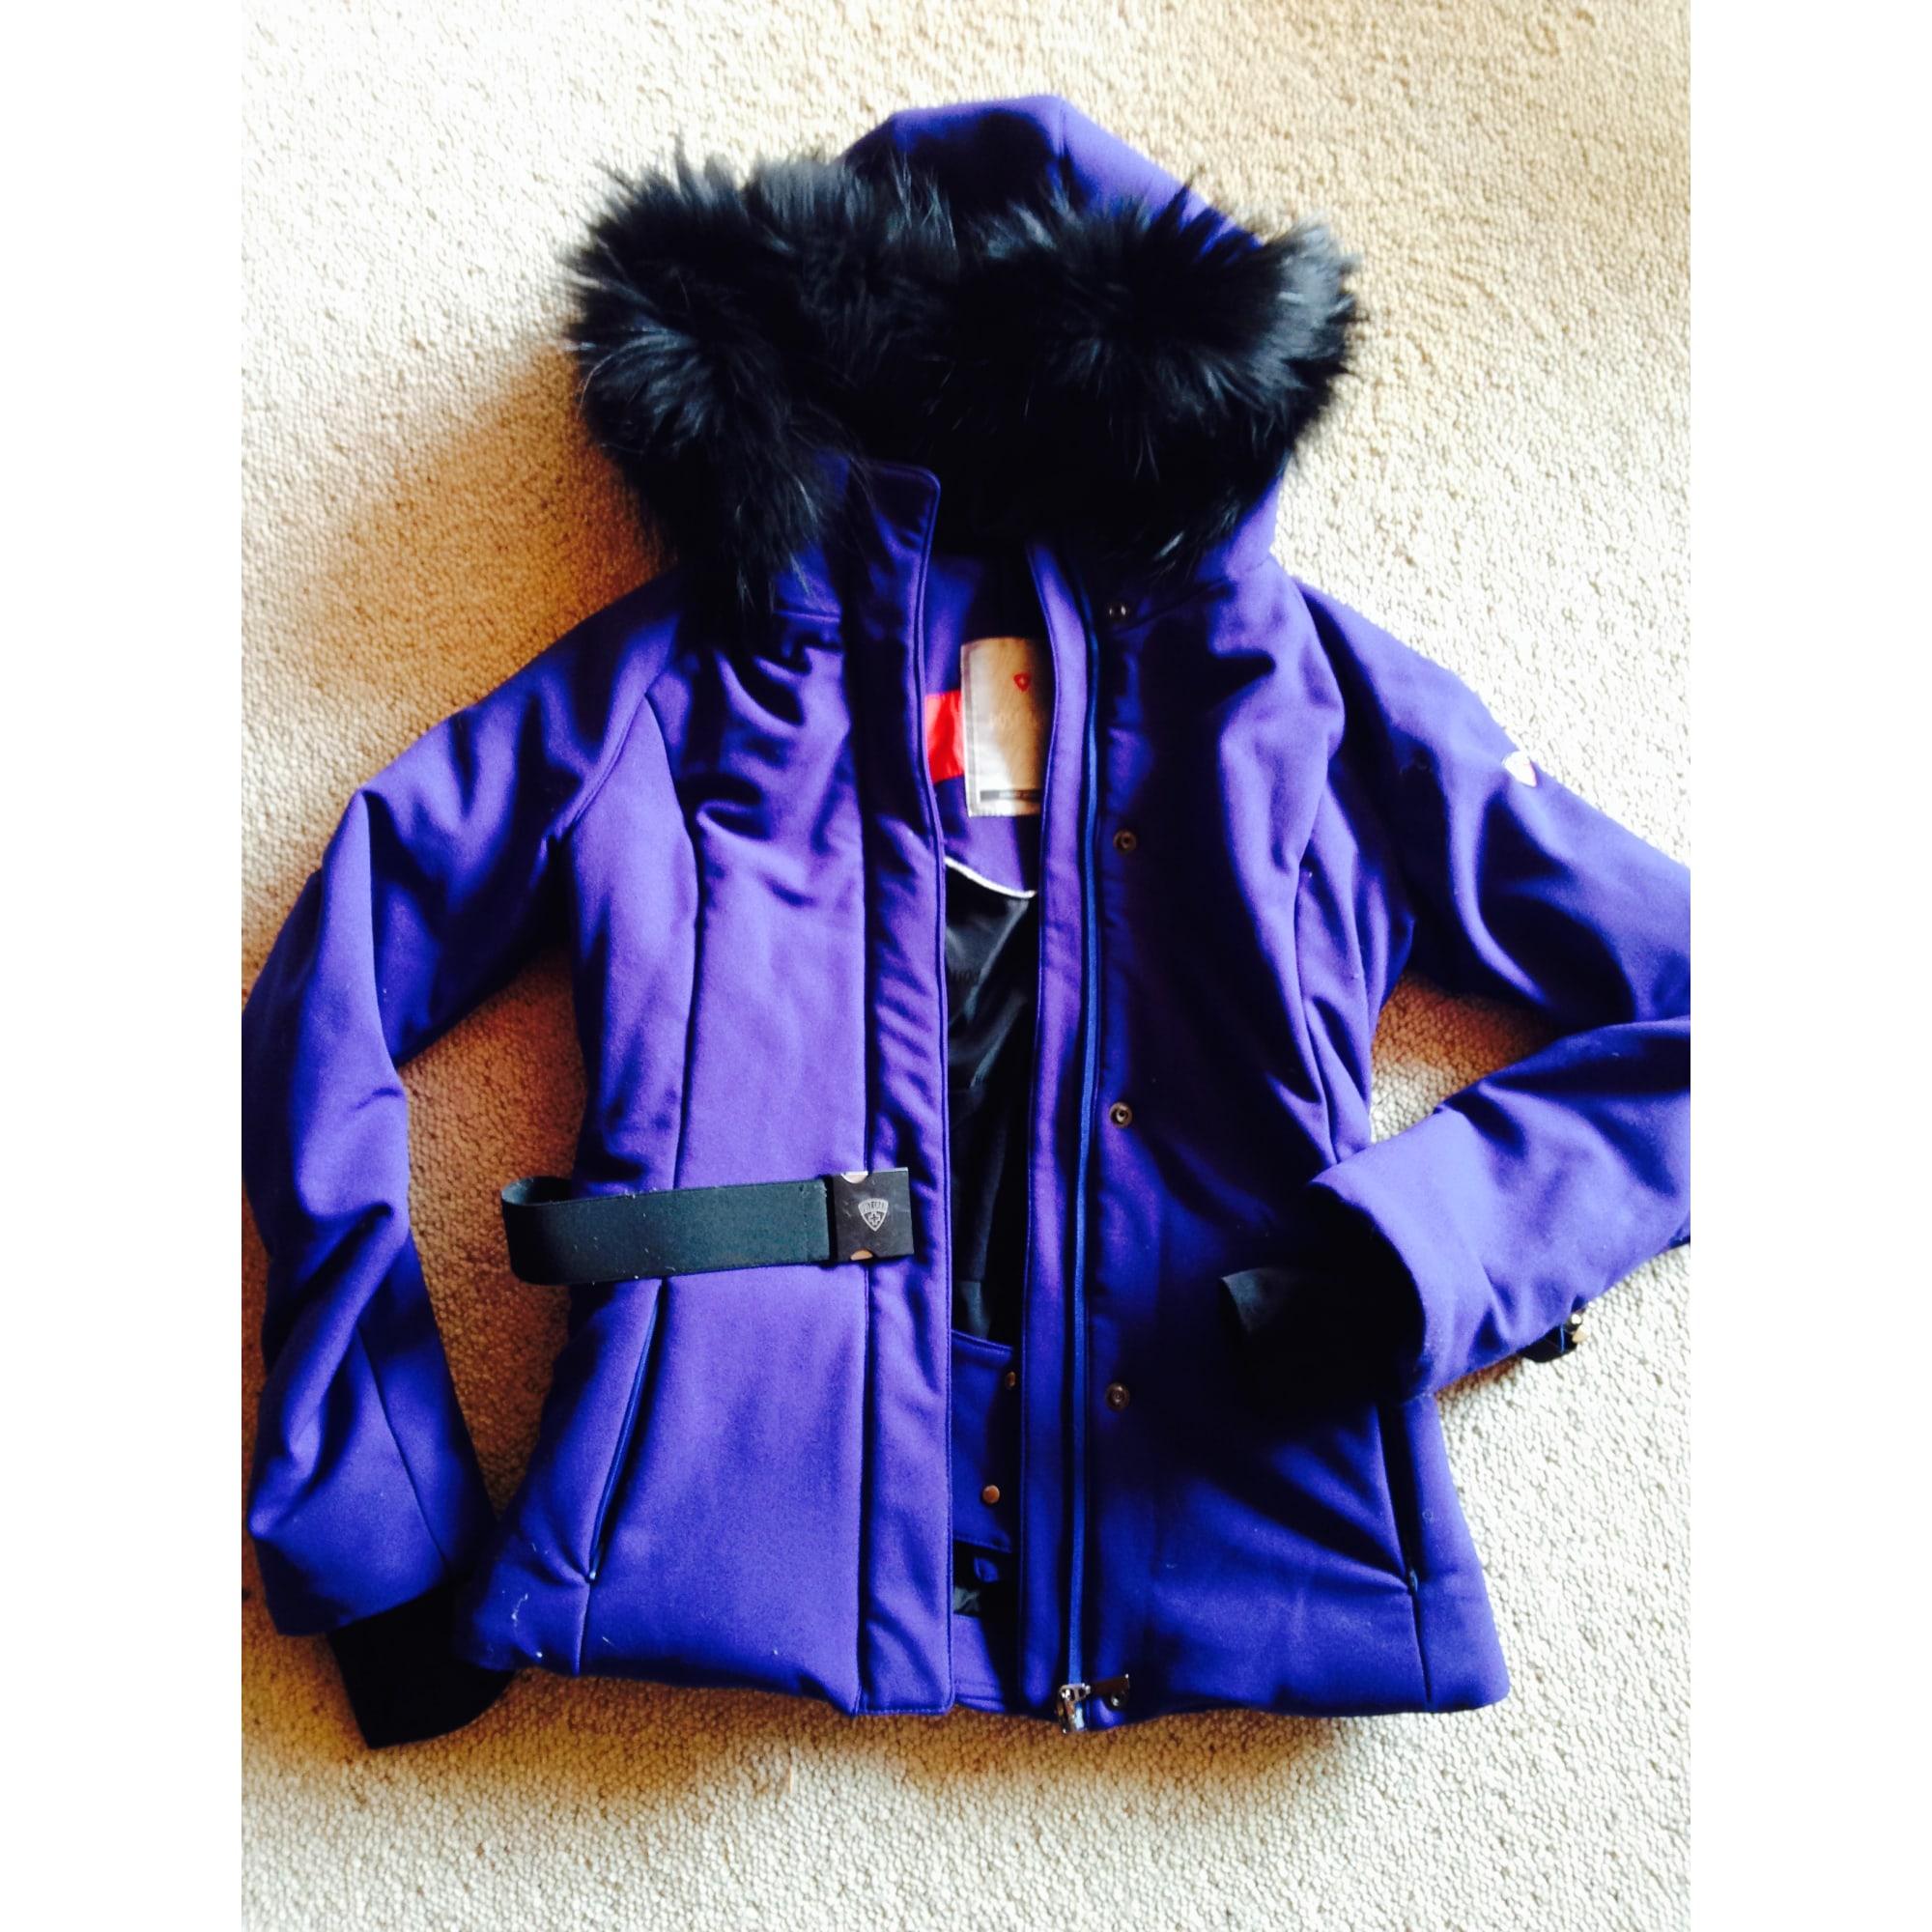 Veste de ski femme vide dressing